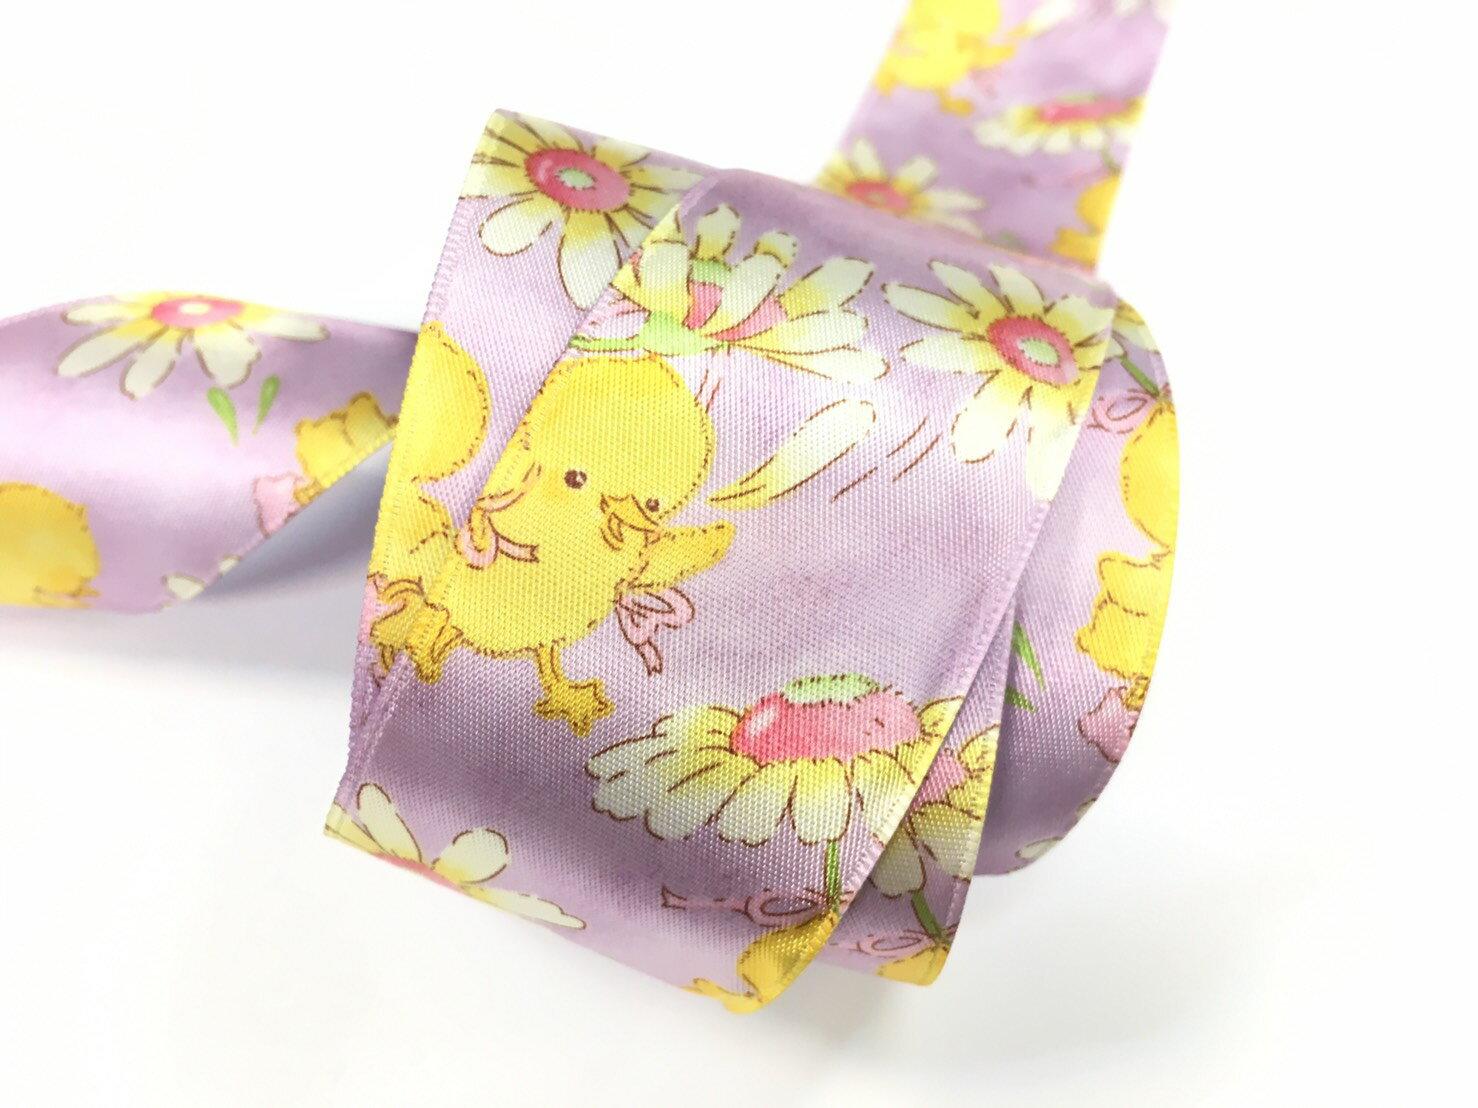 【Crystal Rose緞帶專賣店】黃色小雞單面緞緞帶 38mm 3碼 (4色) 2